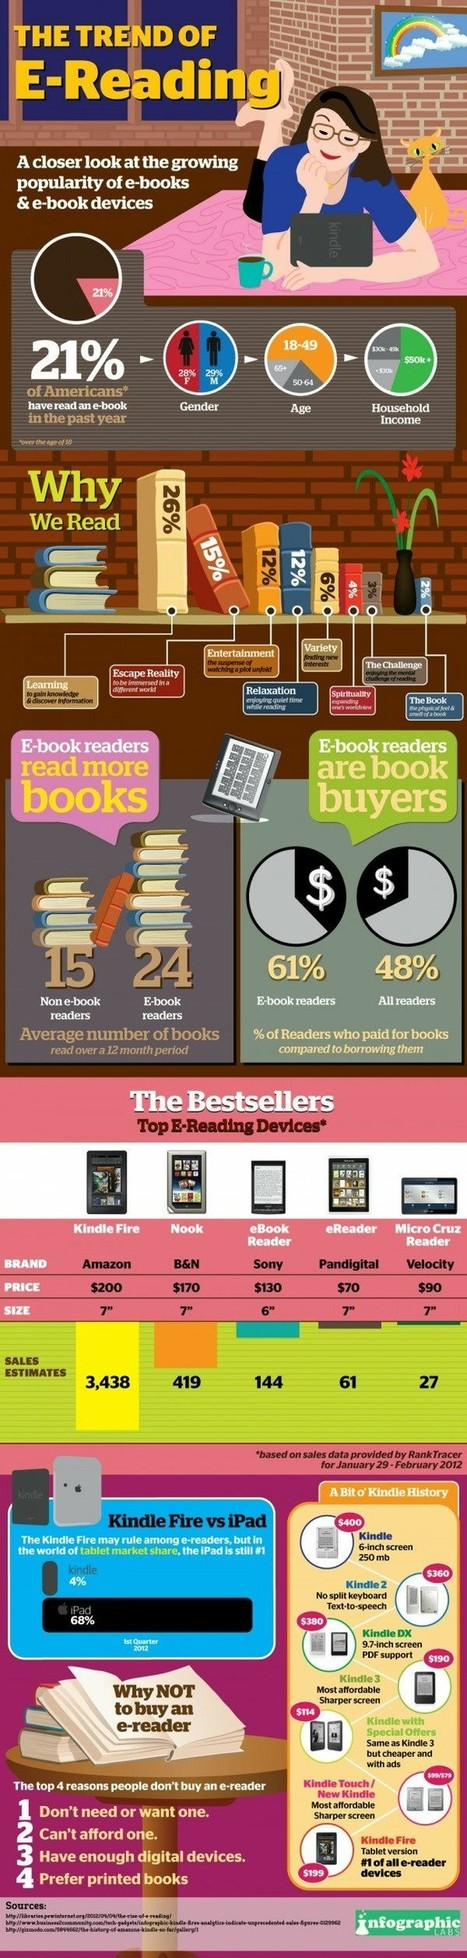 eBooks & eReaders | eBooks and libraries | Scoop.it